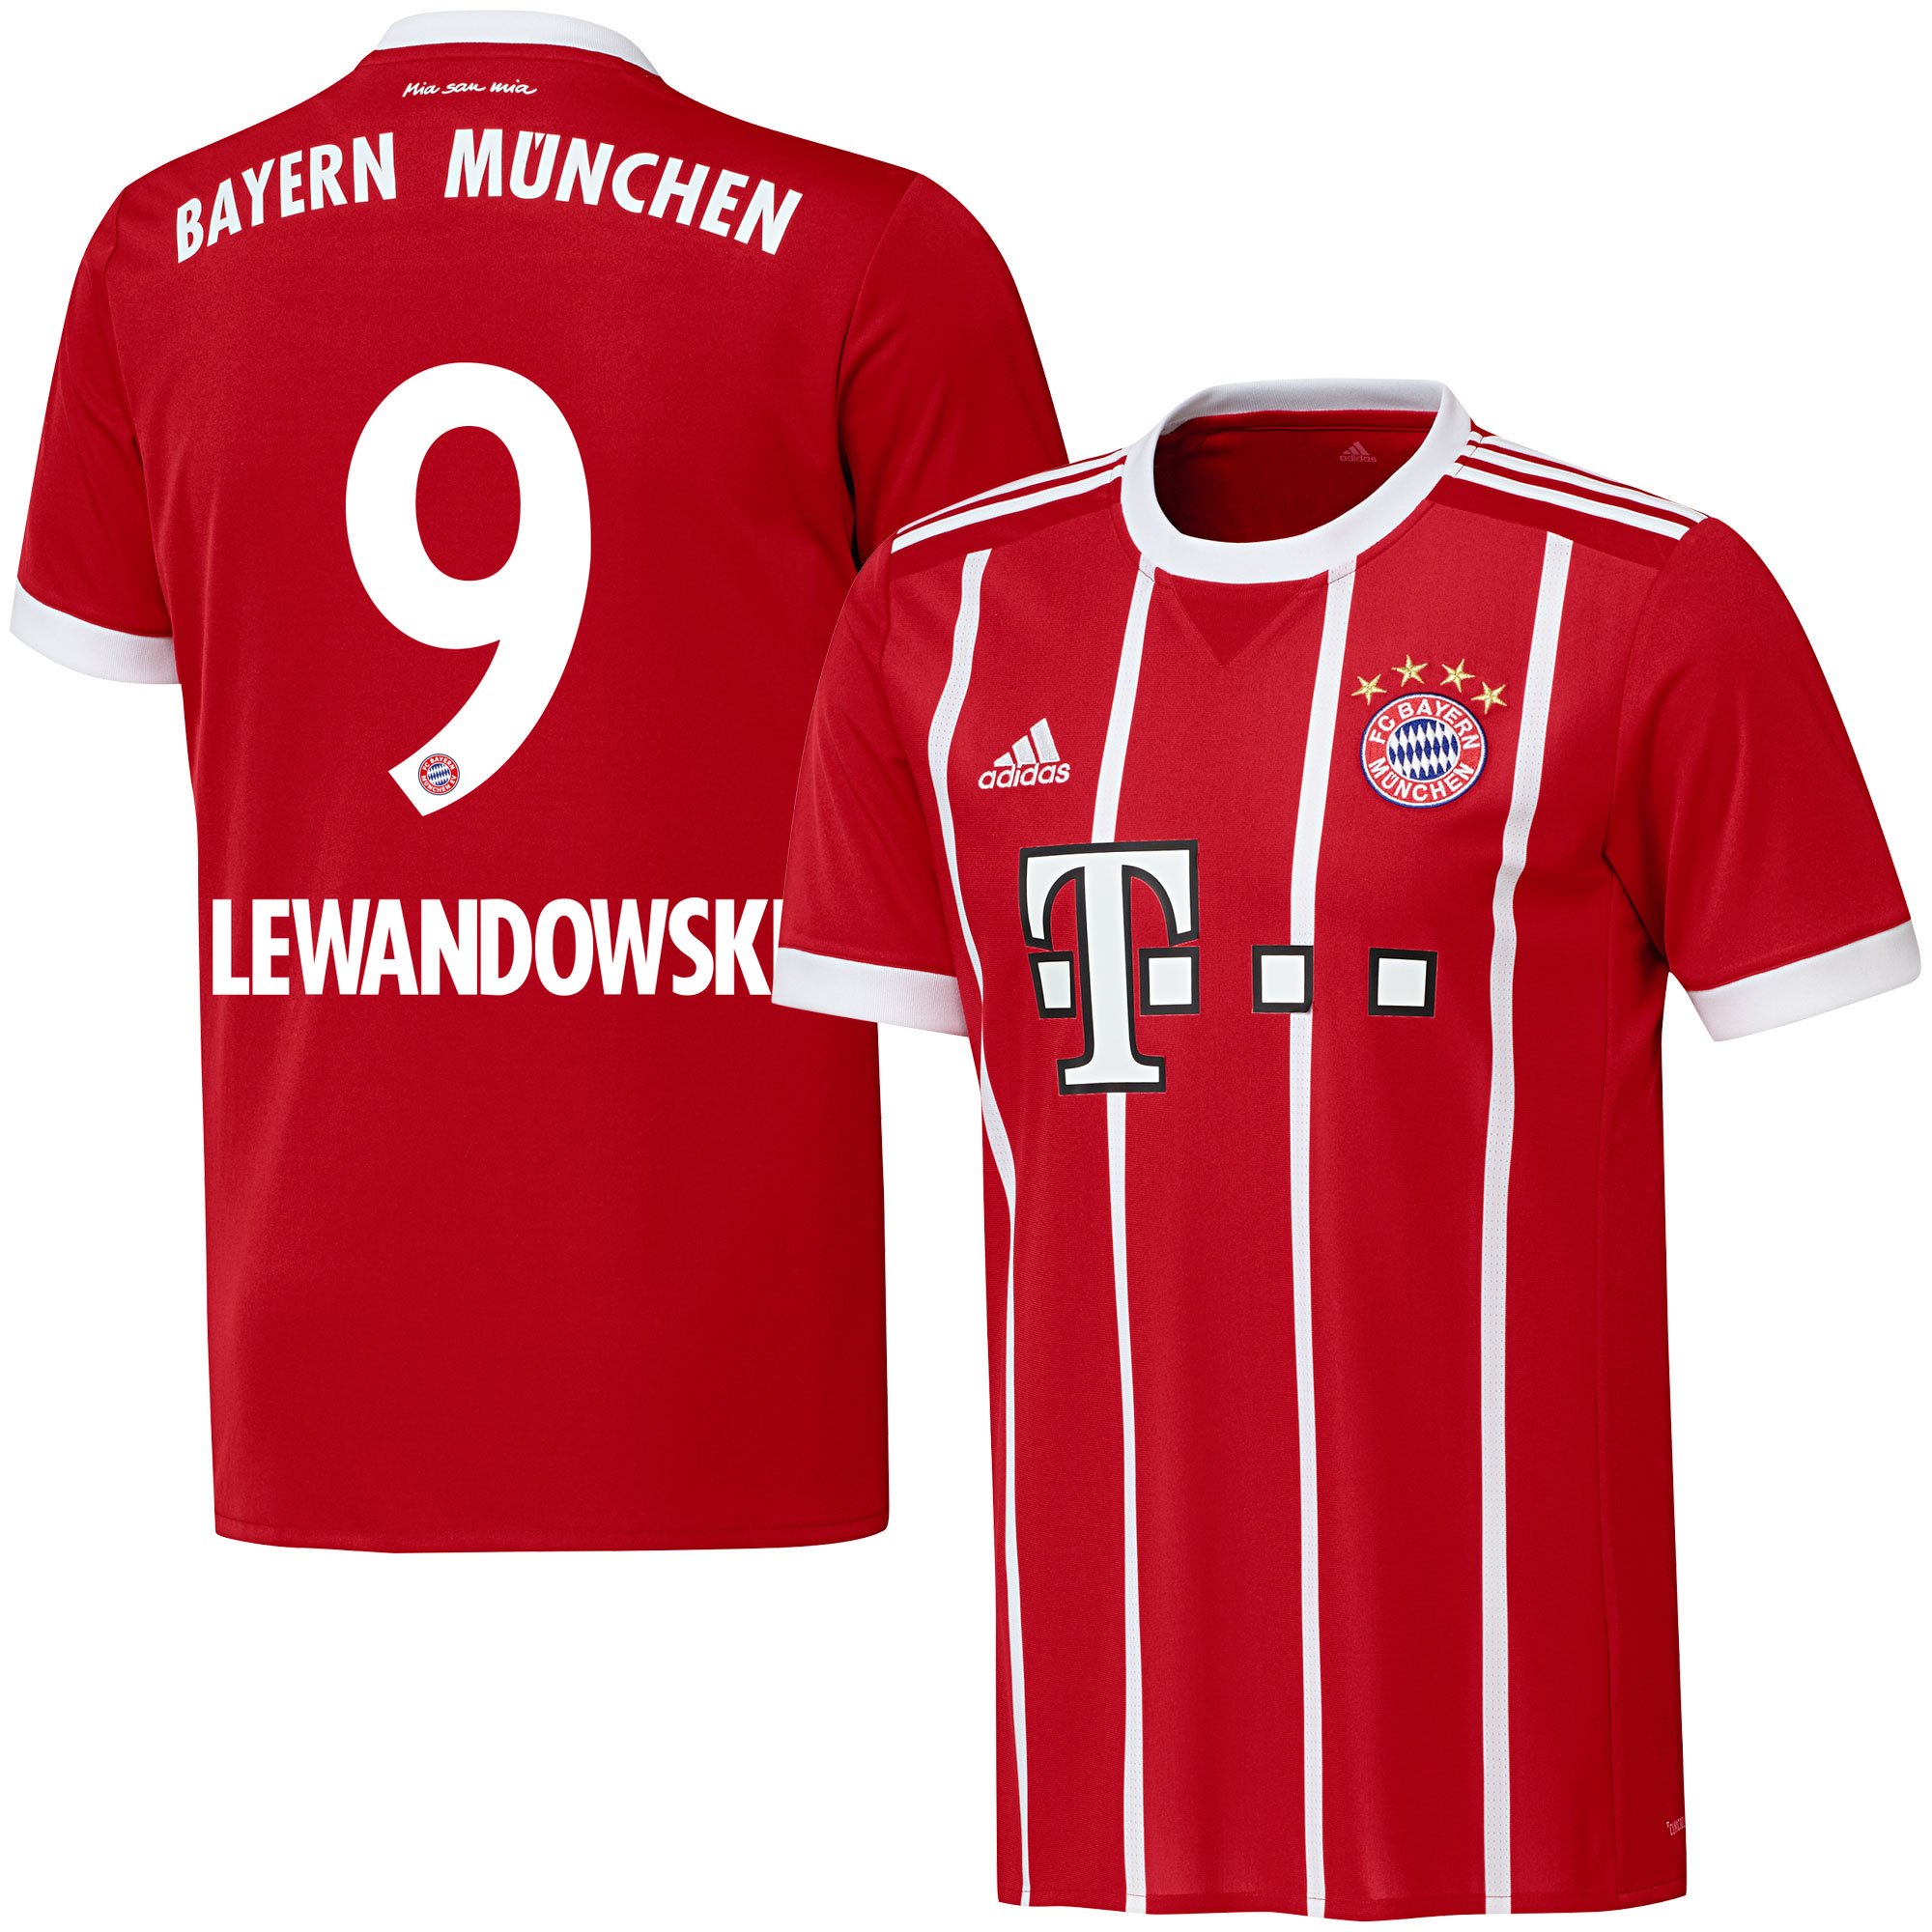 Bayern Munich Home Lewandowski Jersey 2017 / 2018 (Official Printing) - 58